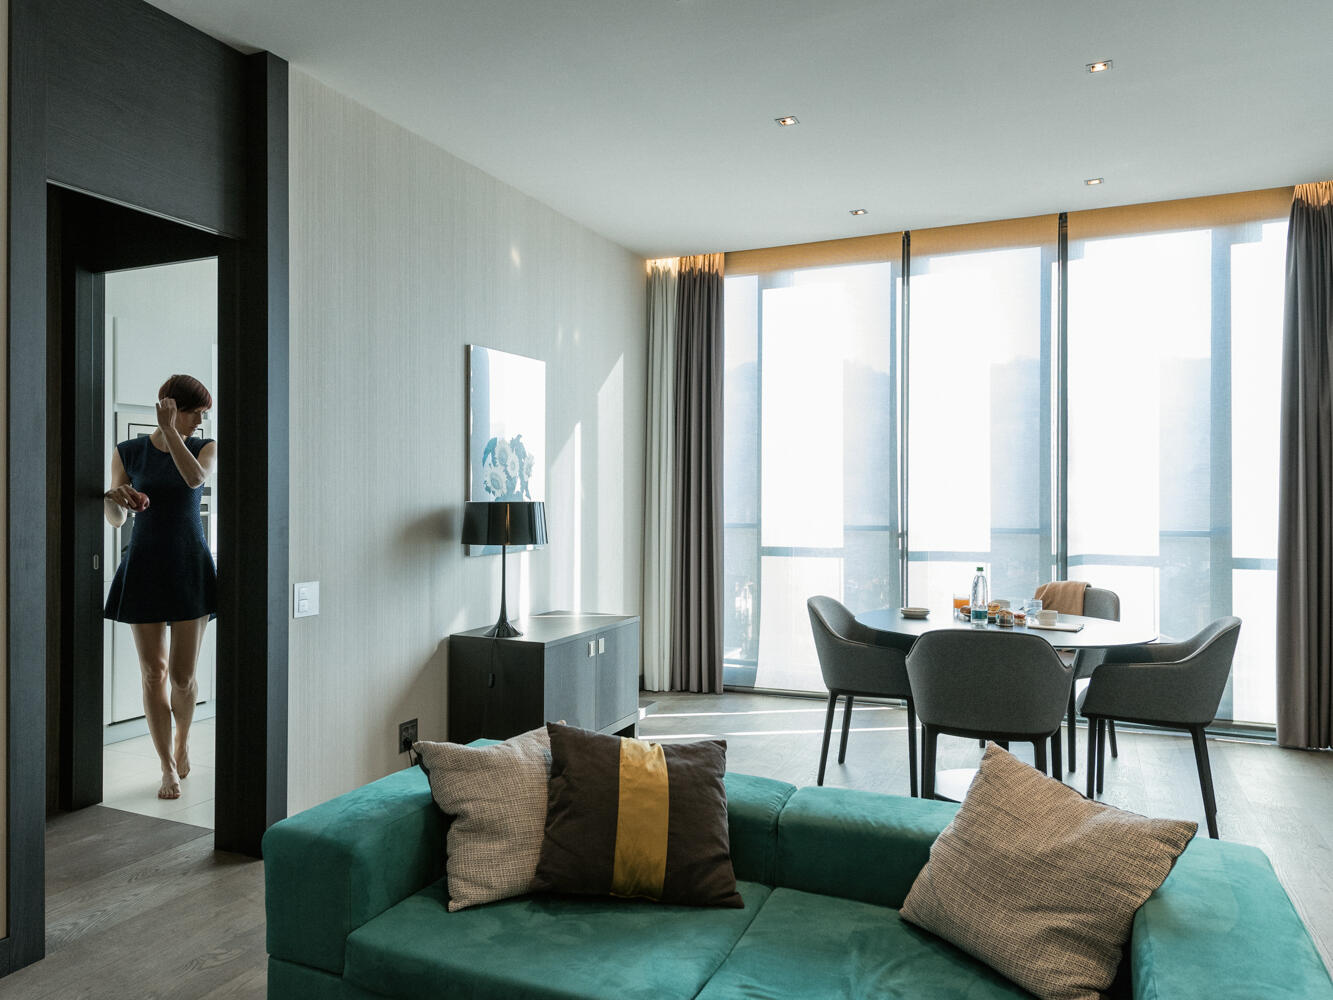 Luxury Suite con due camere, DUPARC Contemporary Suites Torino